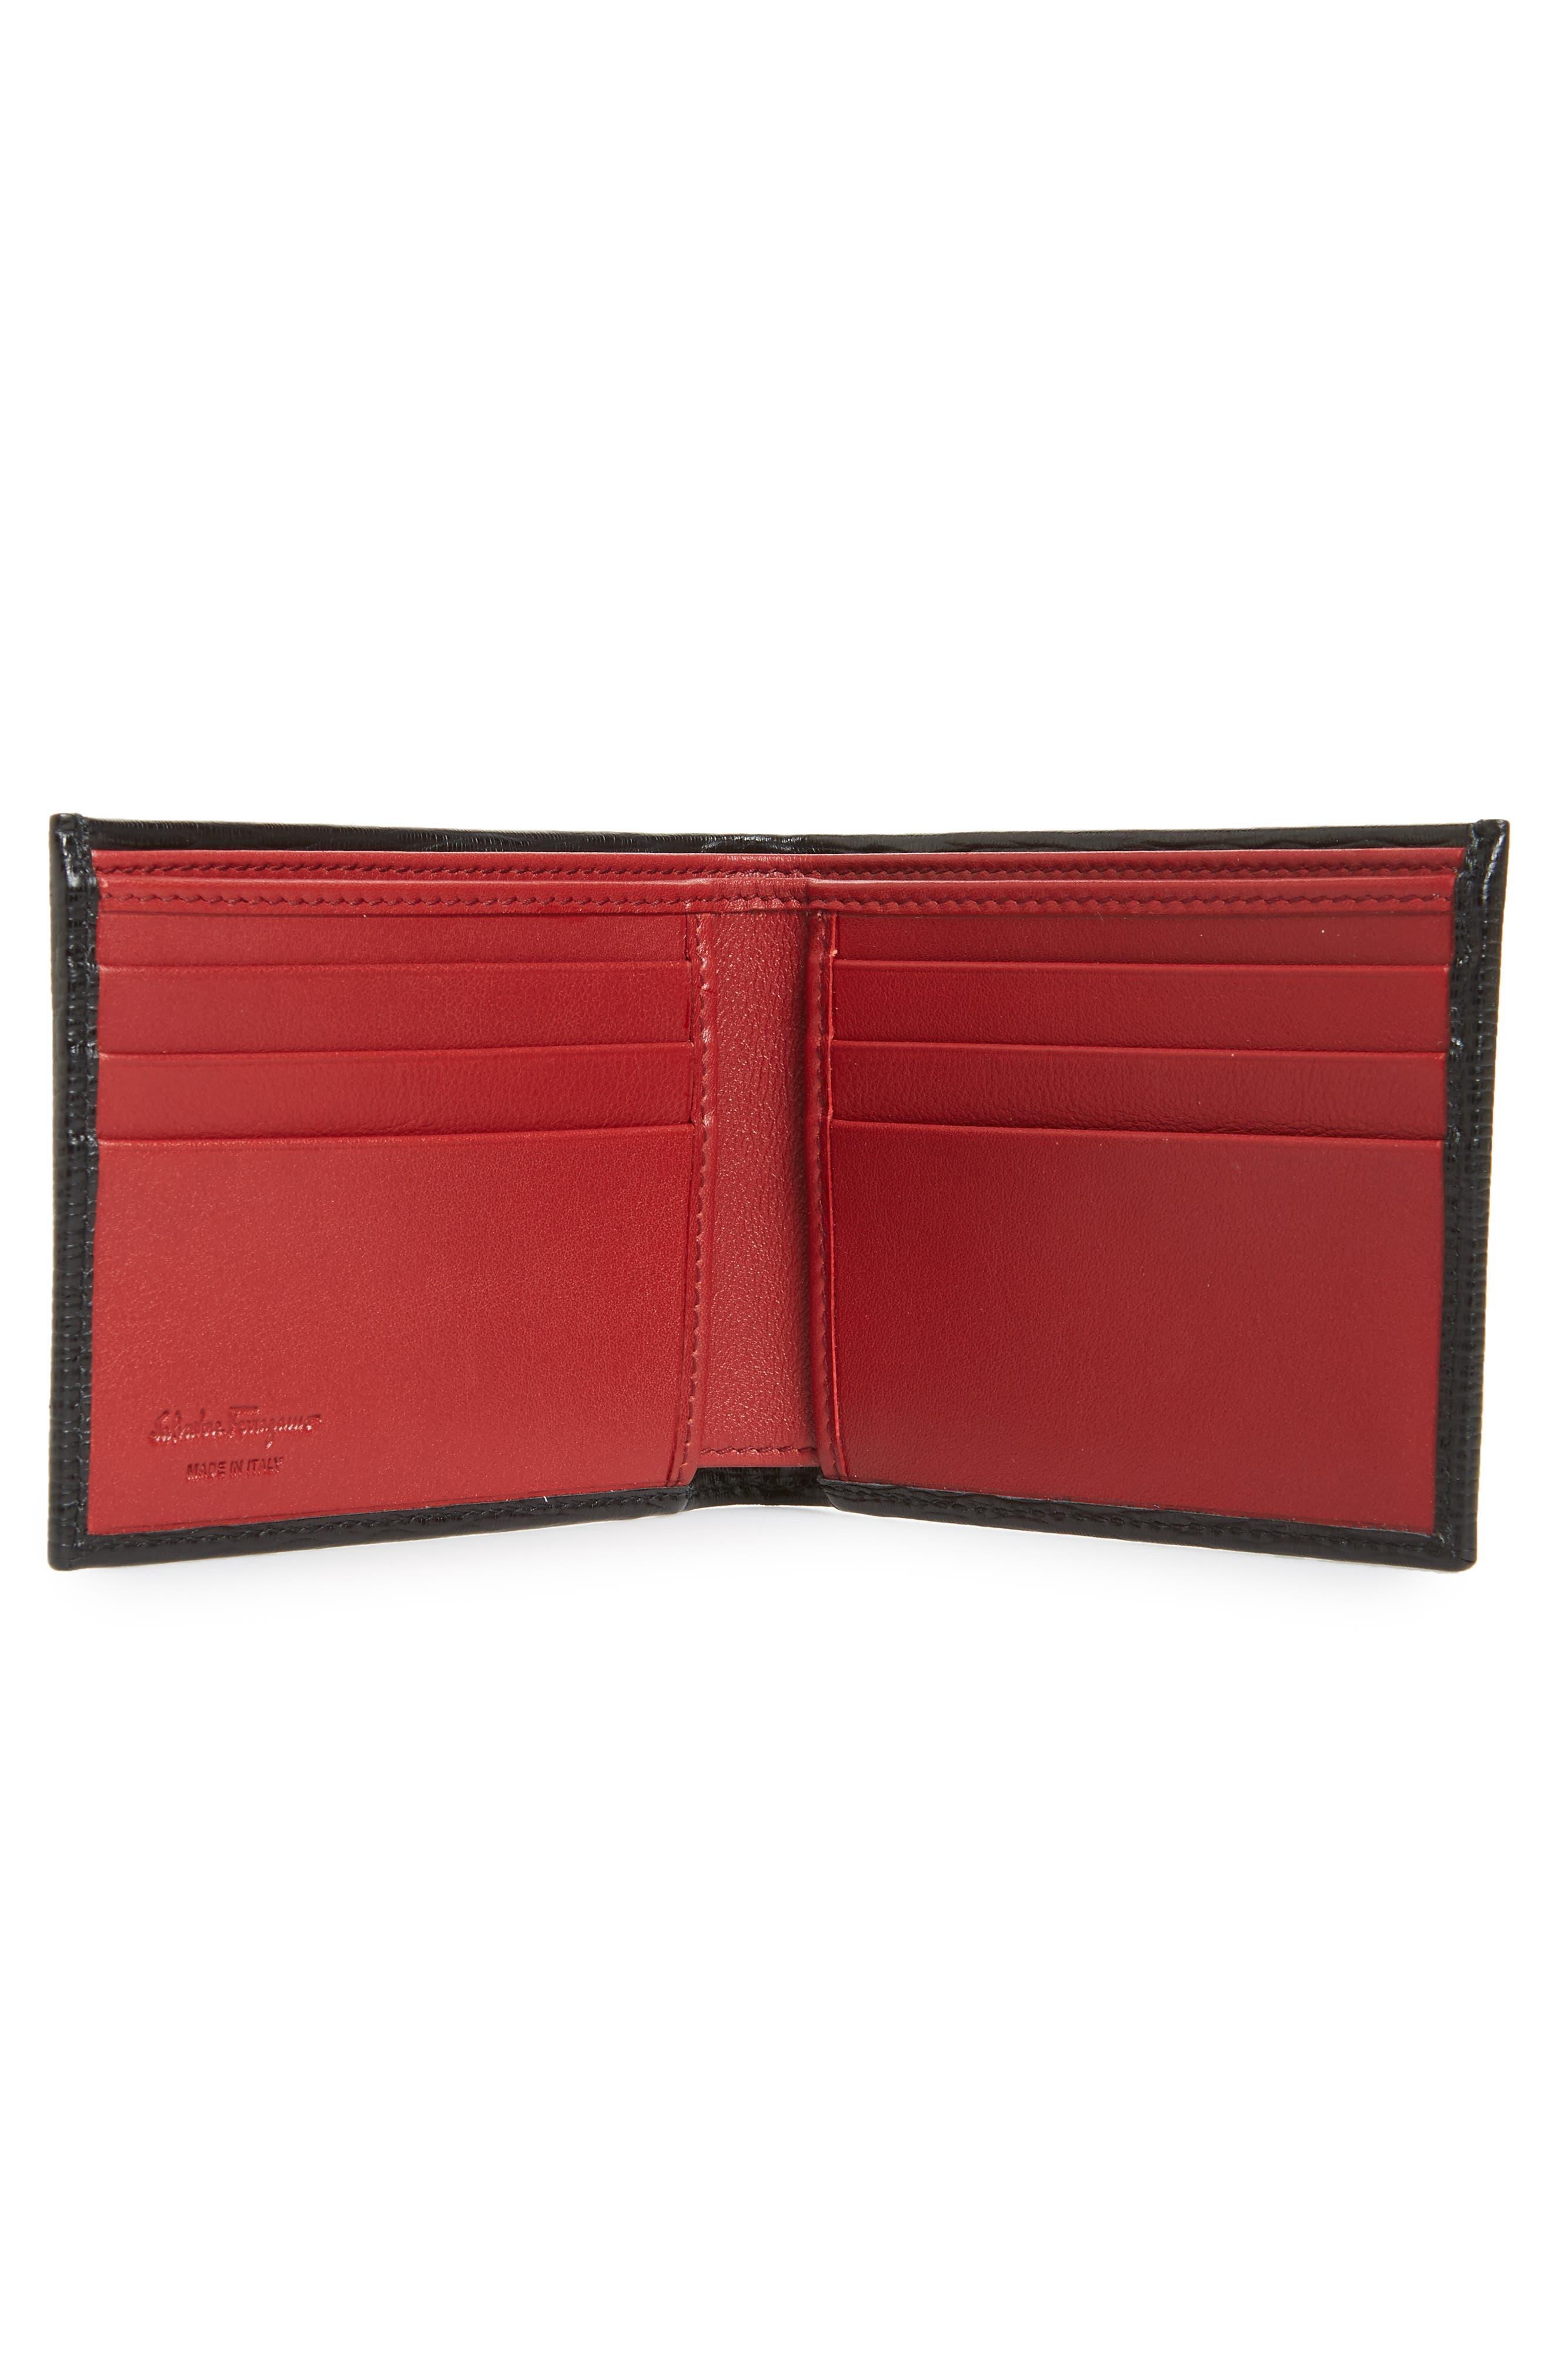 Revival Leather Card Case,                             Alternate thumbnail 2, color,                             019